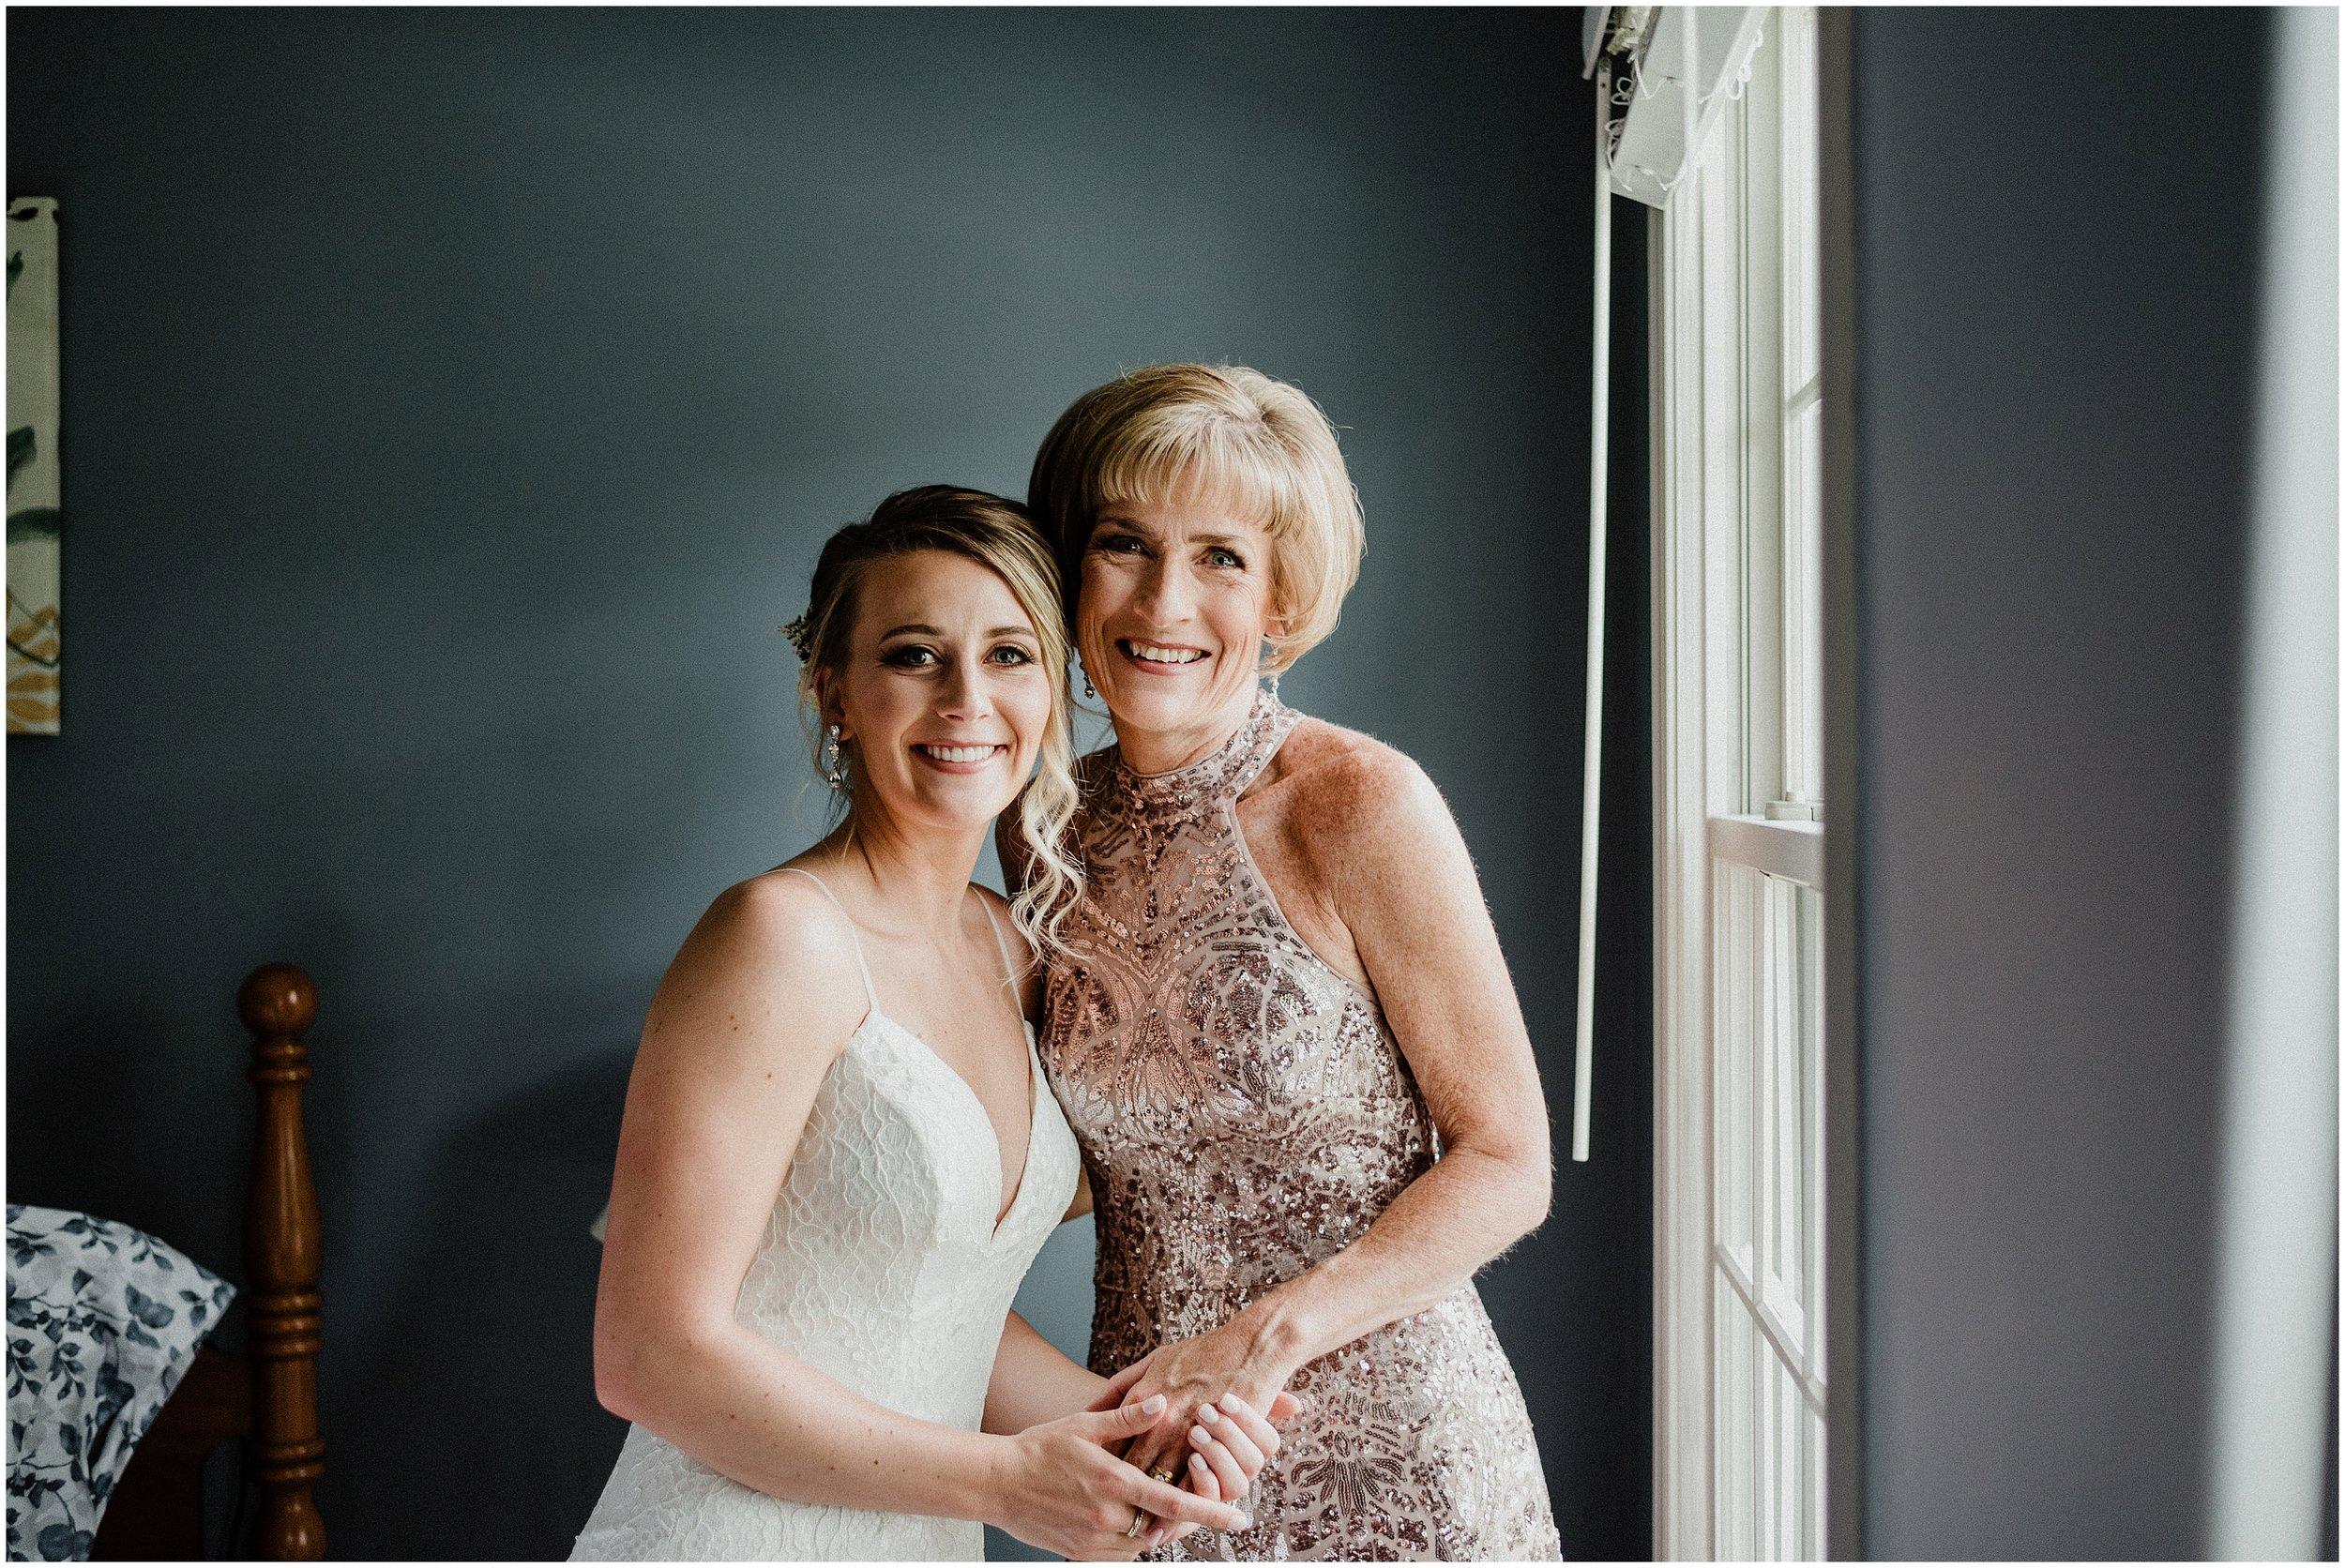 Stephanie and Chris | Elegant Modern Summer Wedding | Meson Sabika, Naperville, IL | Chicago Wedding Photographer